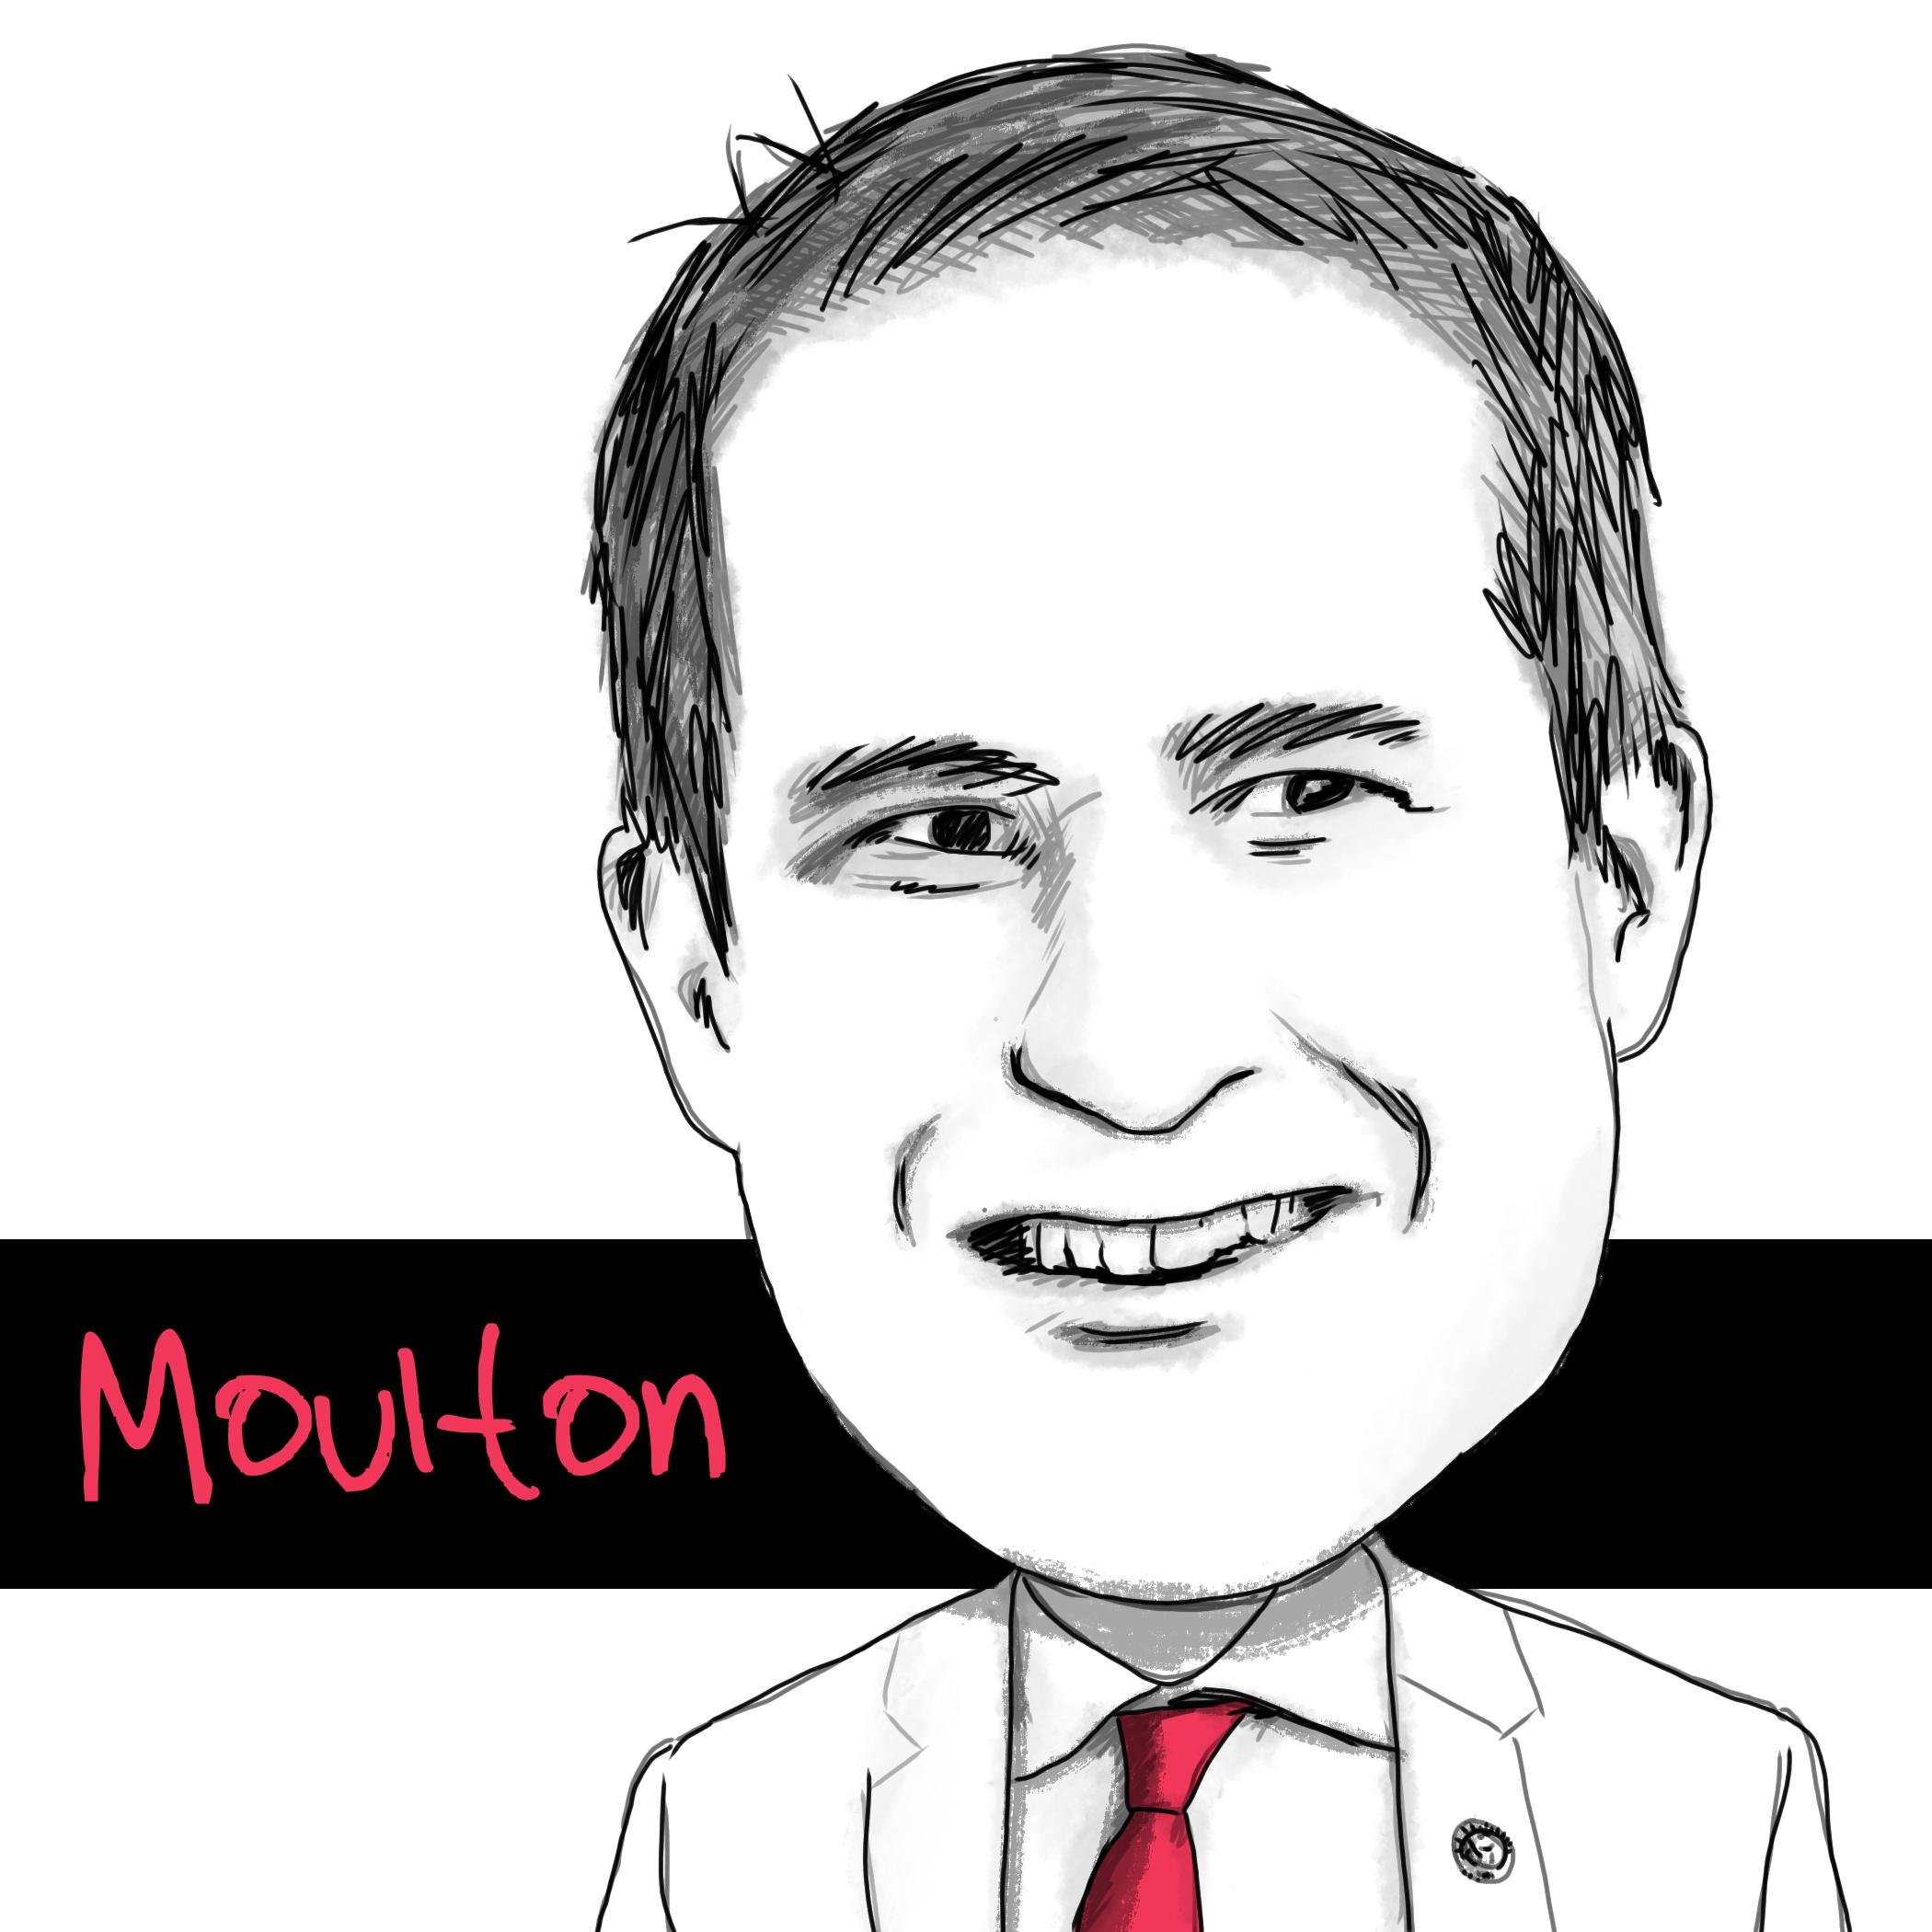 Seth Moulton - https://sethmoulton.com